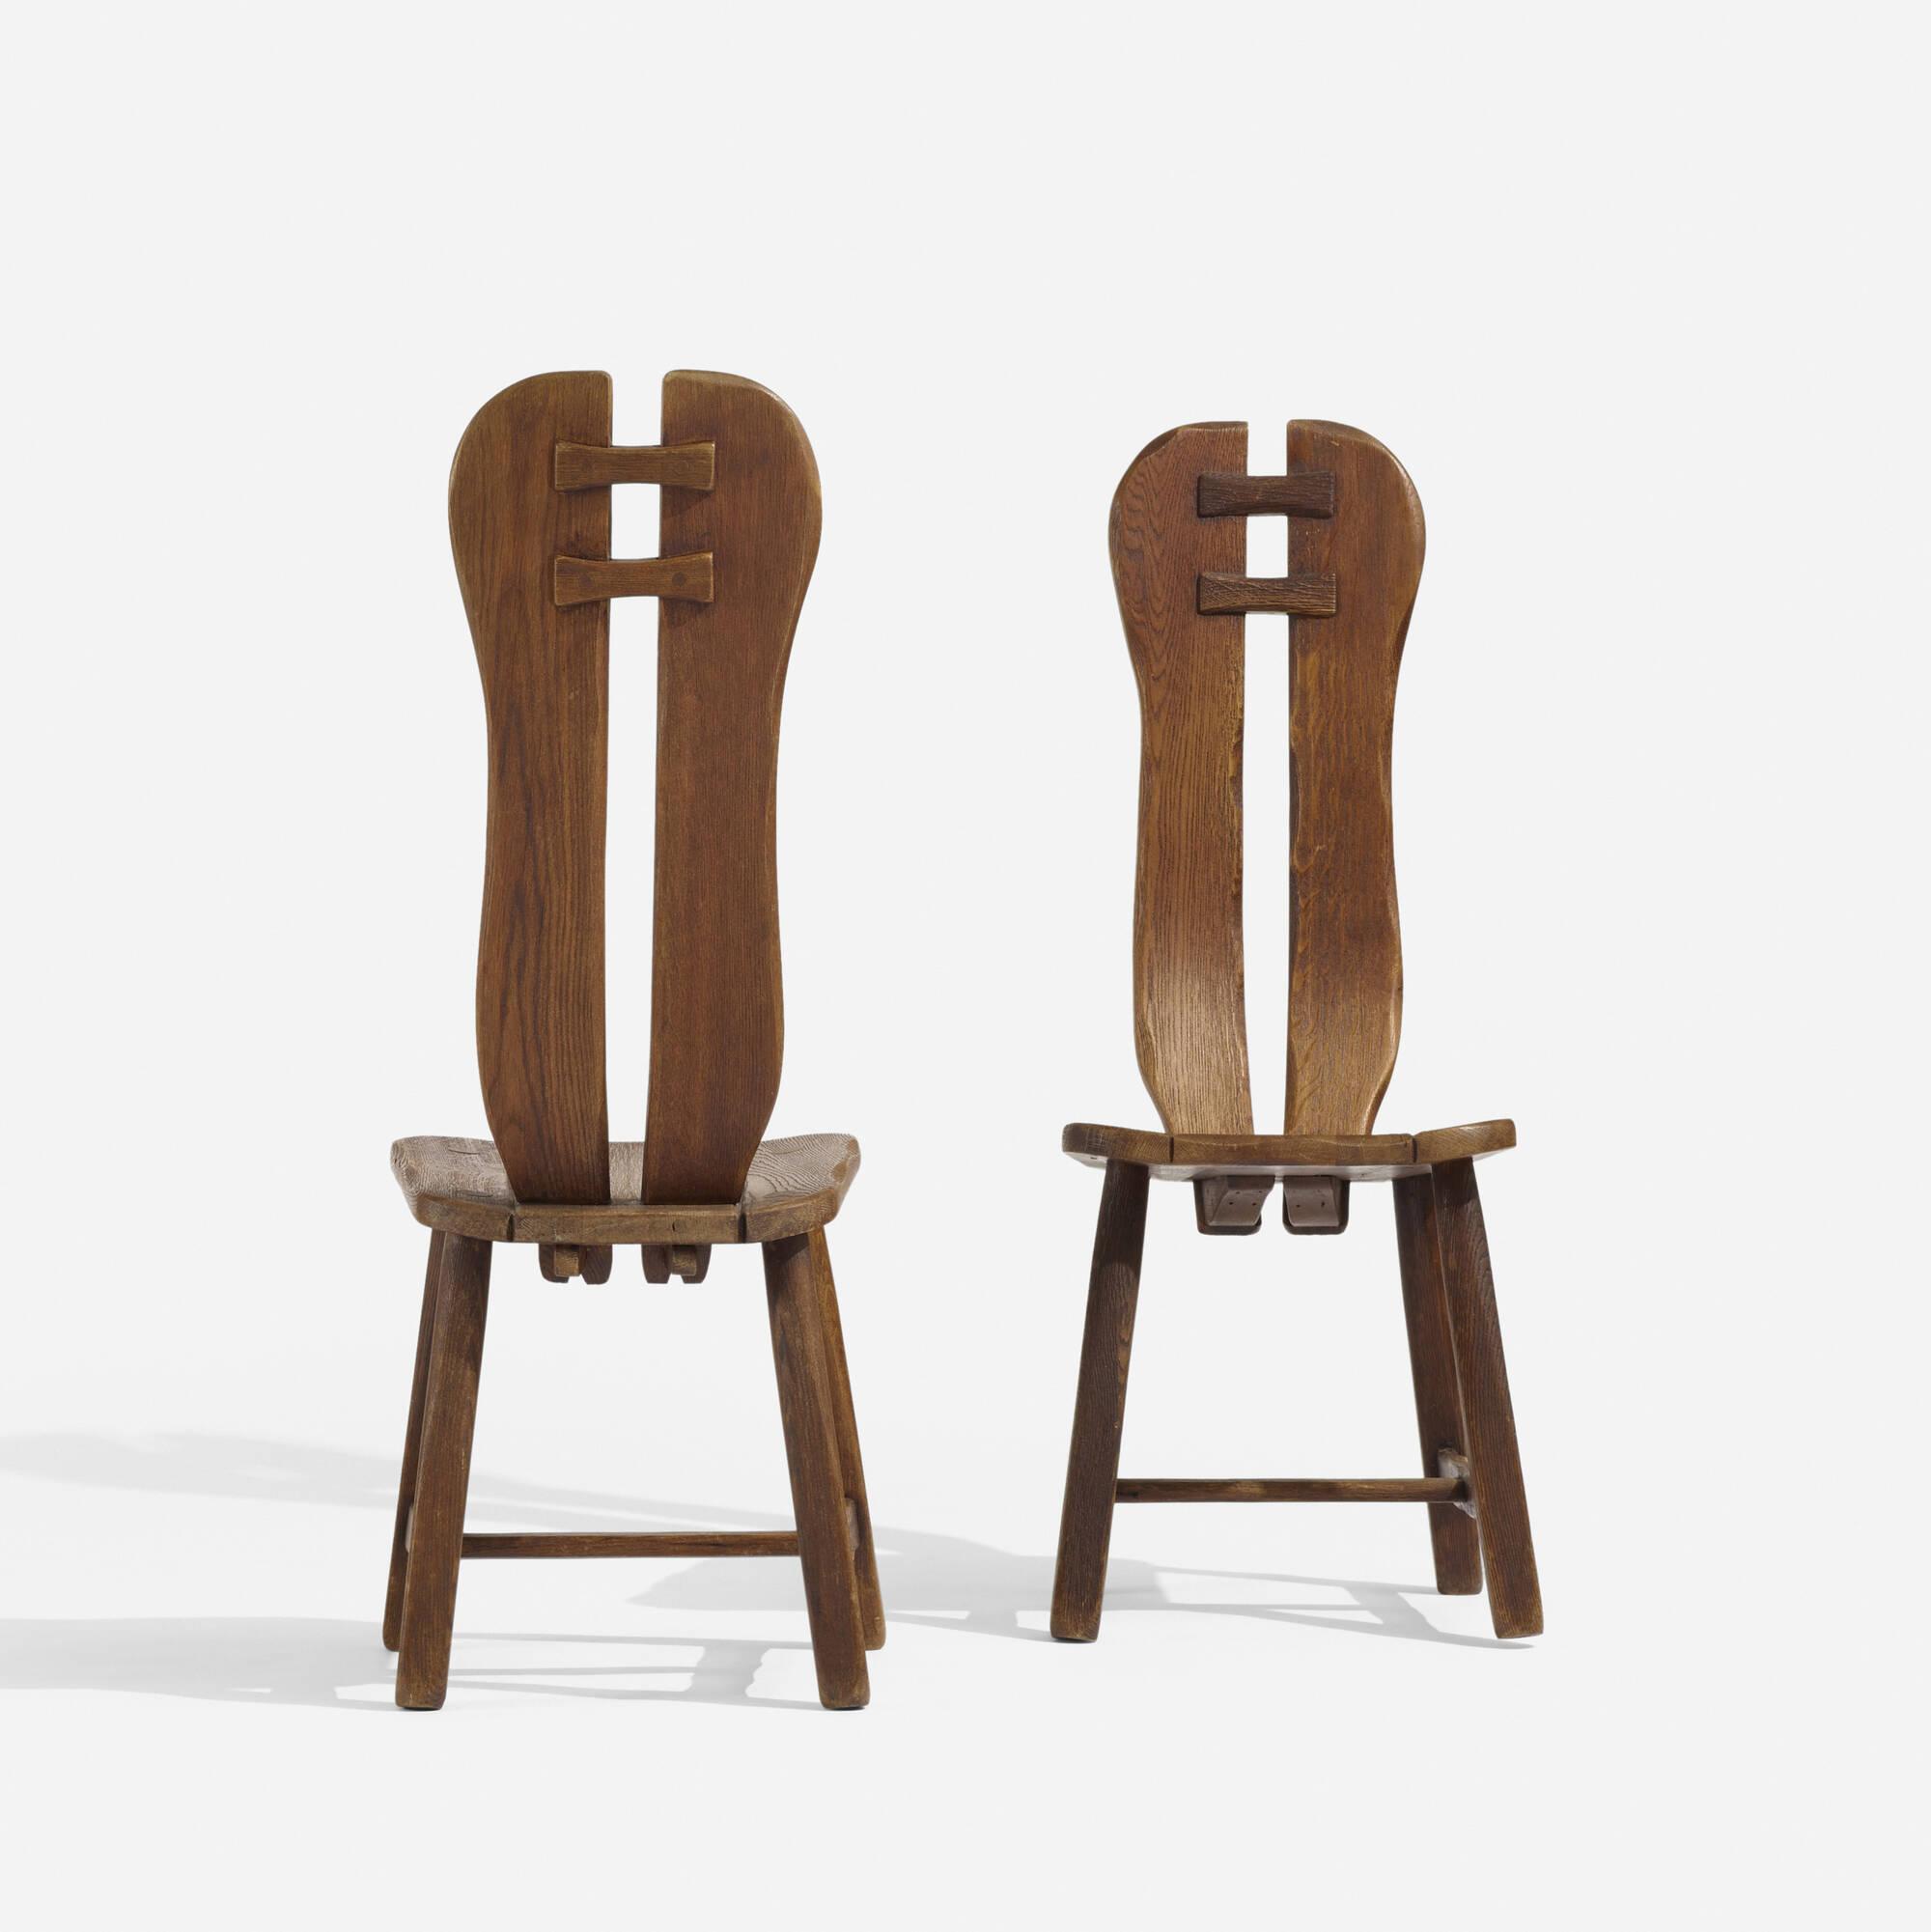 165: Swedish / chairs, pair (2 of 3)